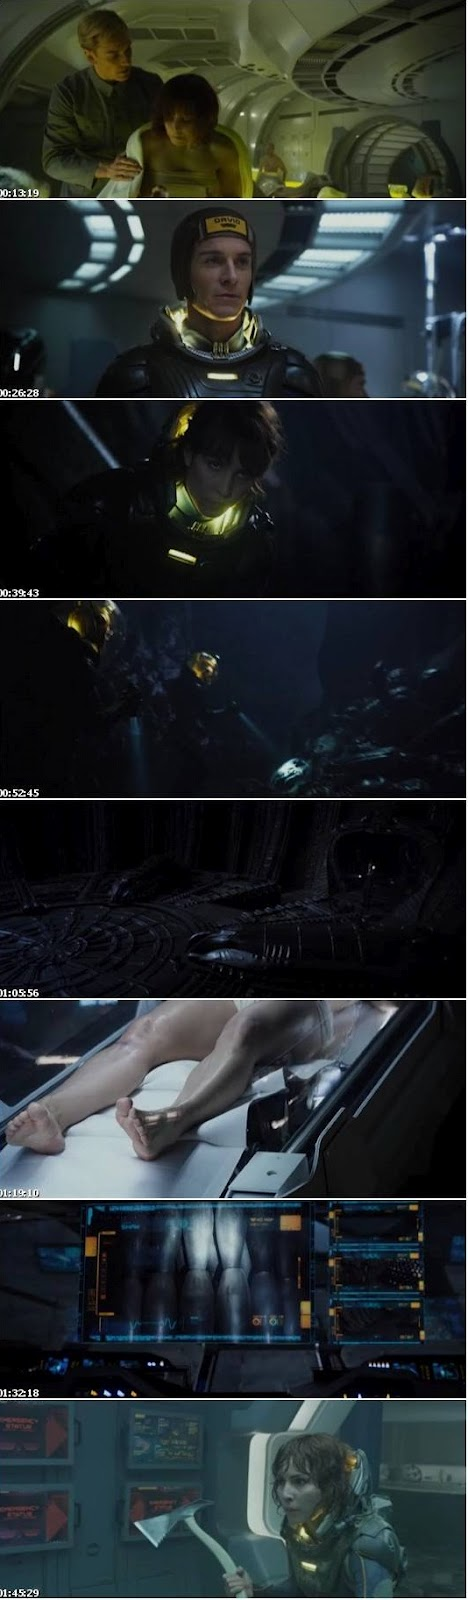 Prometheus+%282012%29+DVDRip+500MB